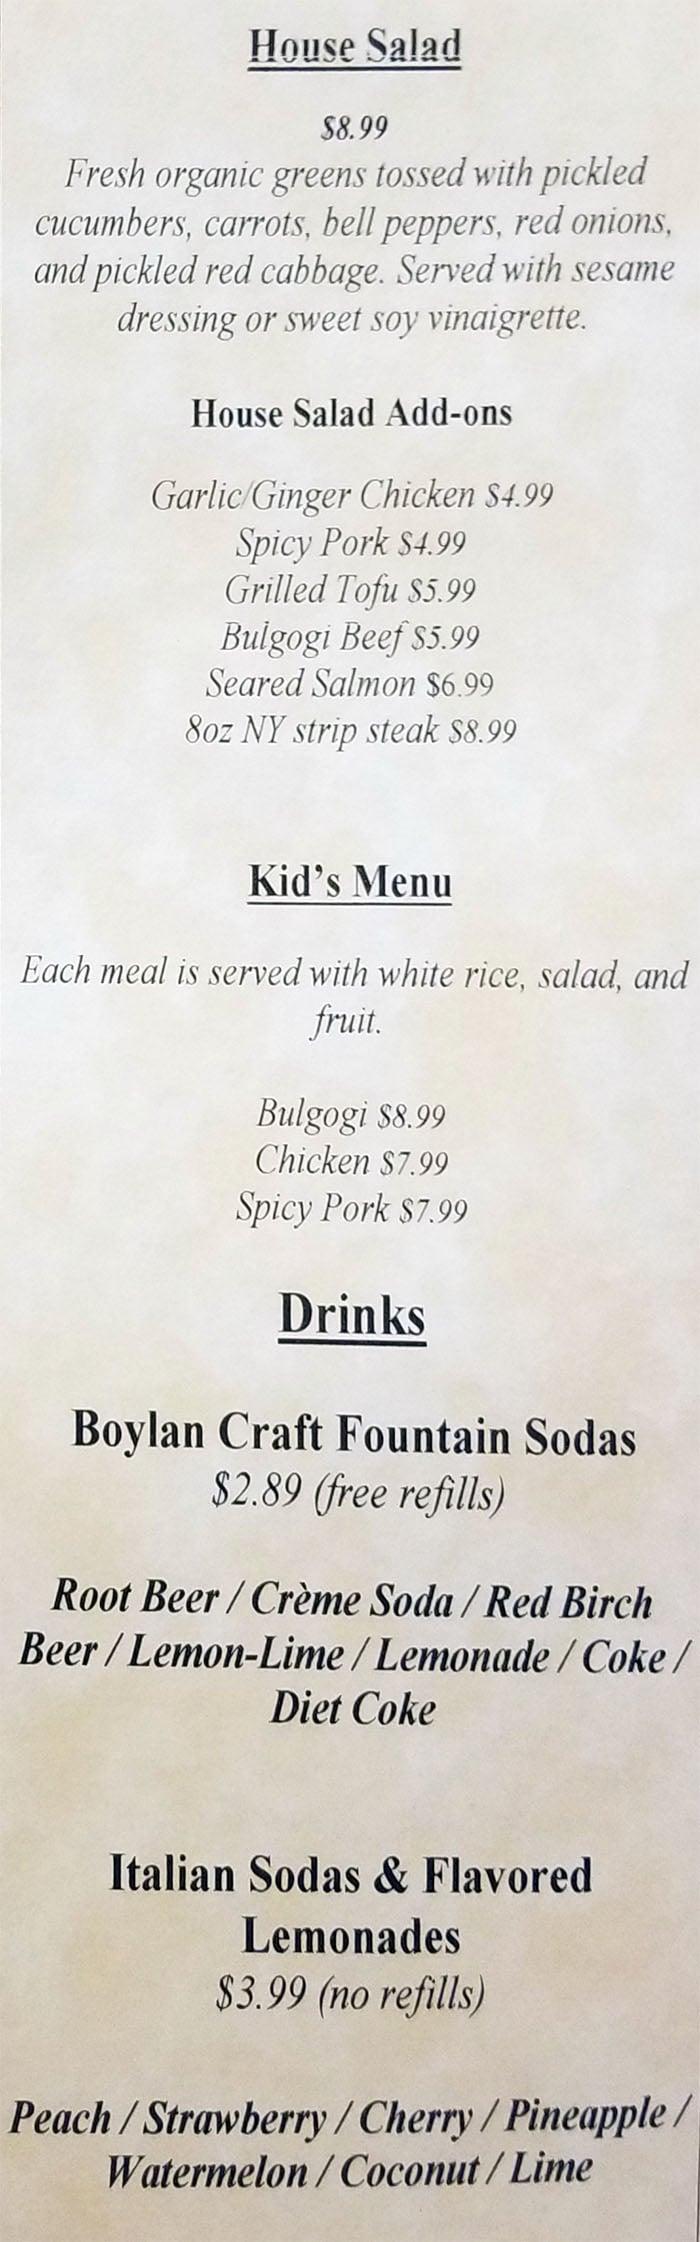 The Angry Korean dinner menu - salads, kids, drinks